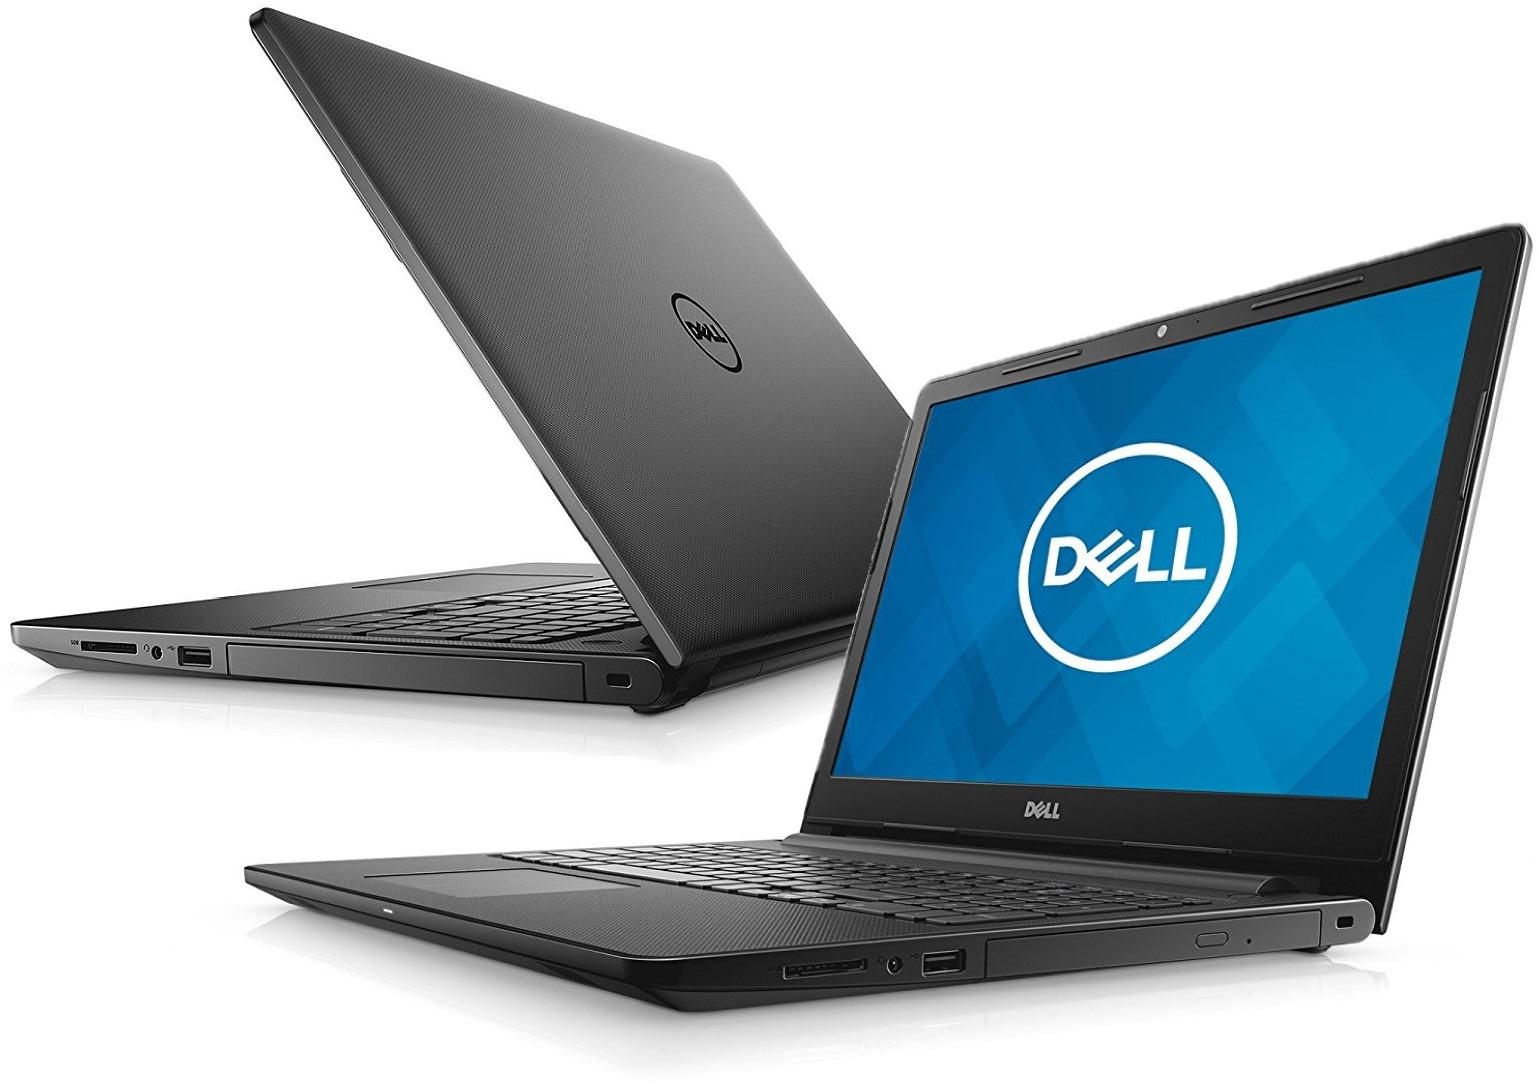 Laptop Dell Inspiron 15 3567 I3 156 12gb 1tb W10 7100458352 3576